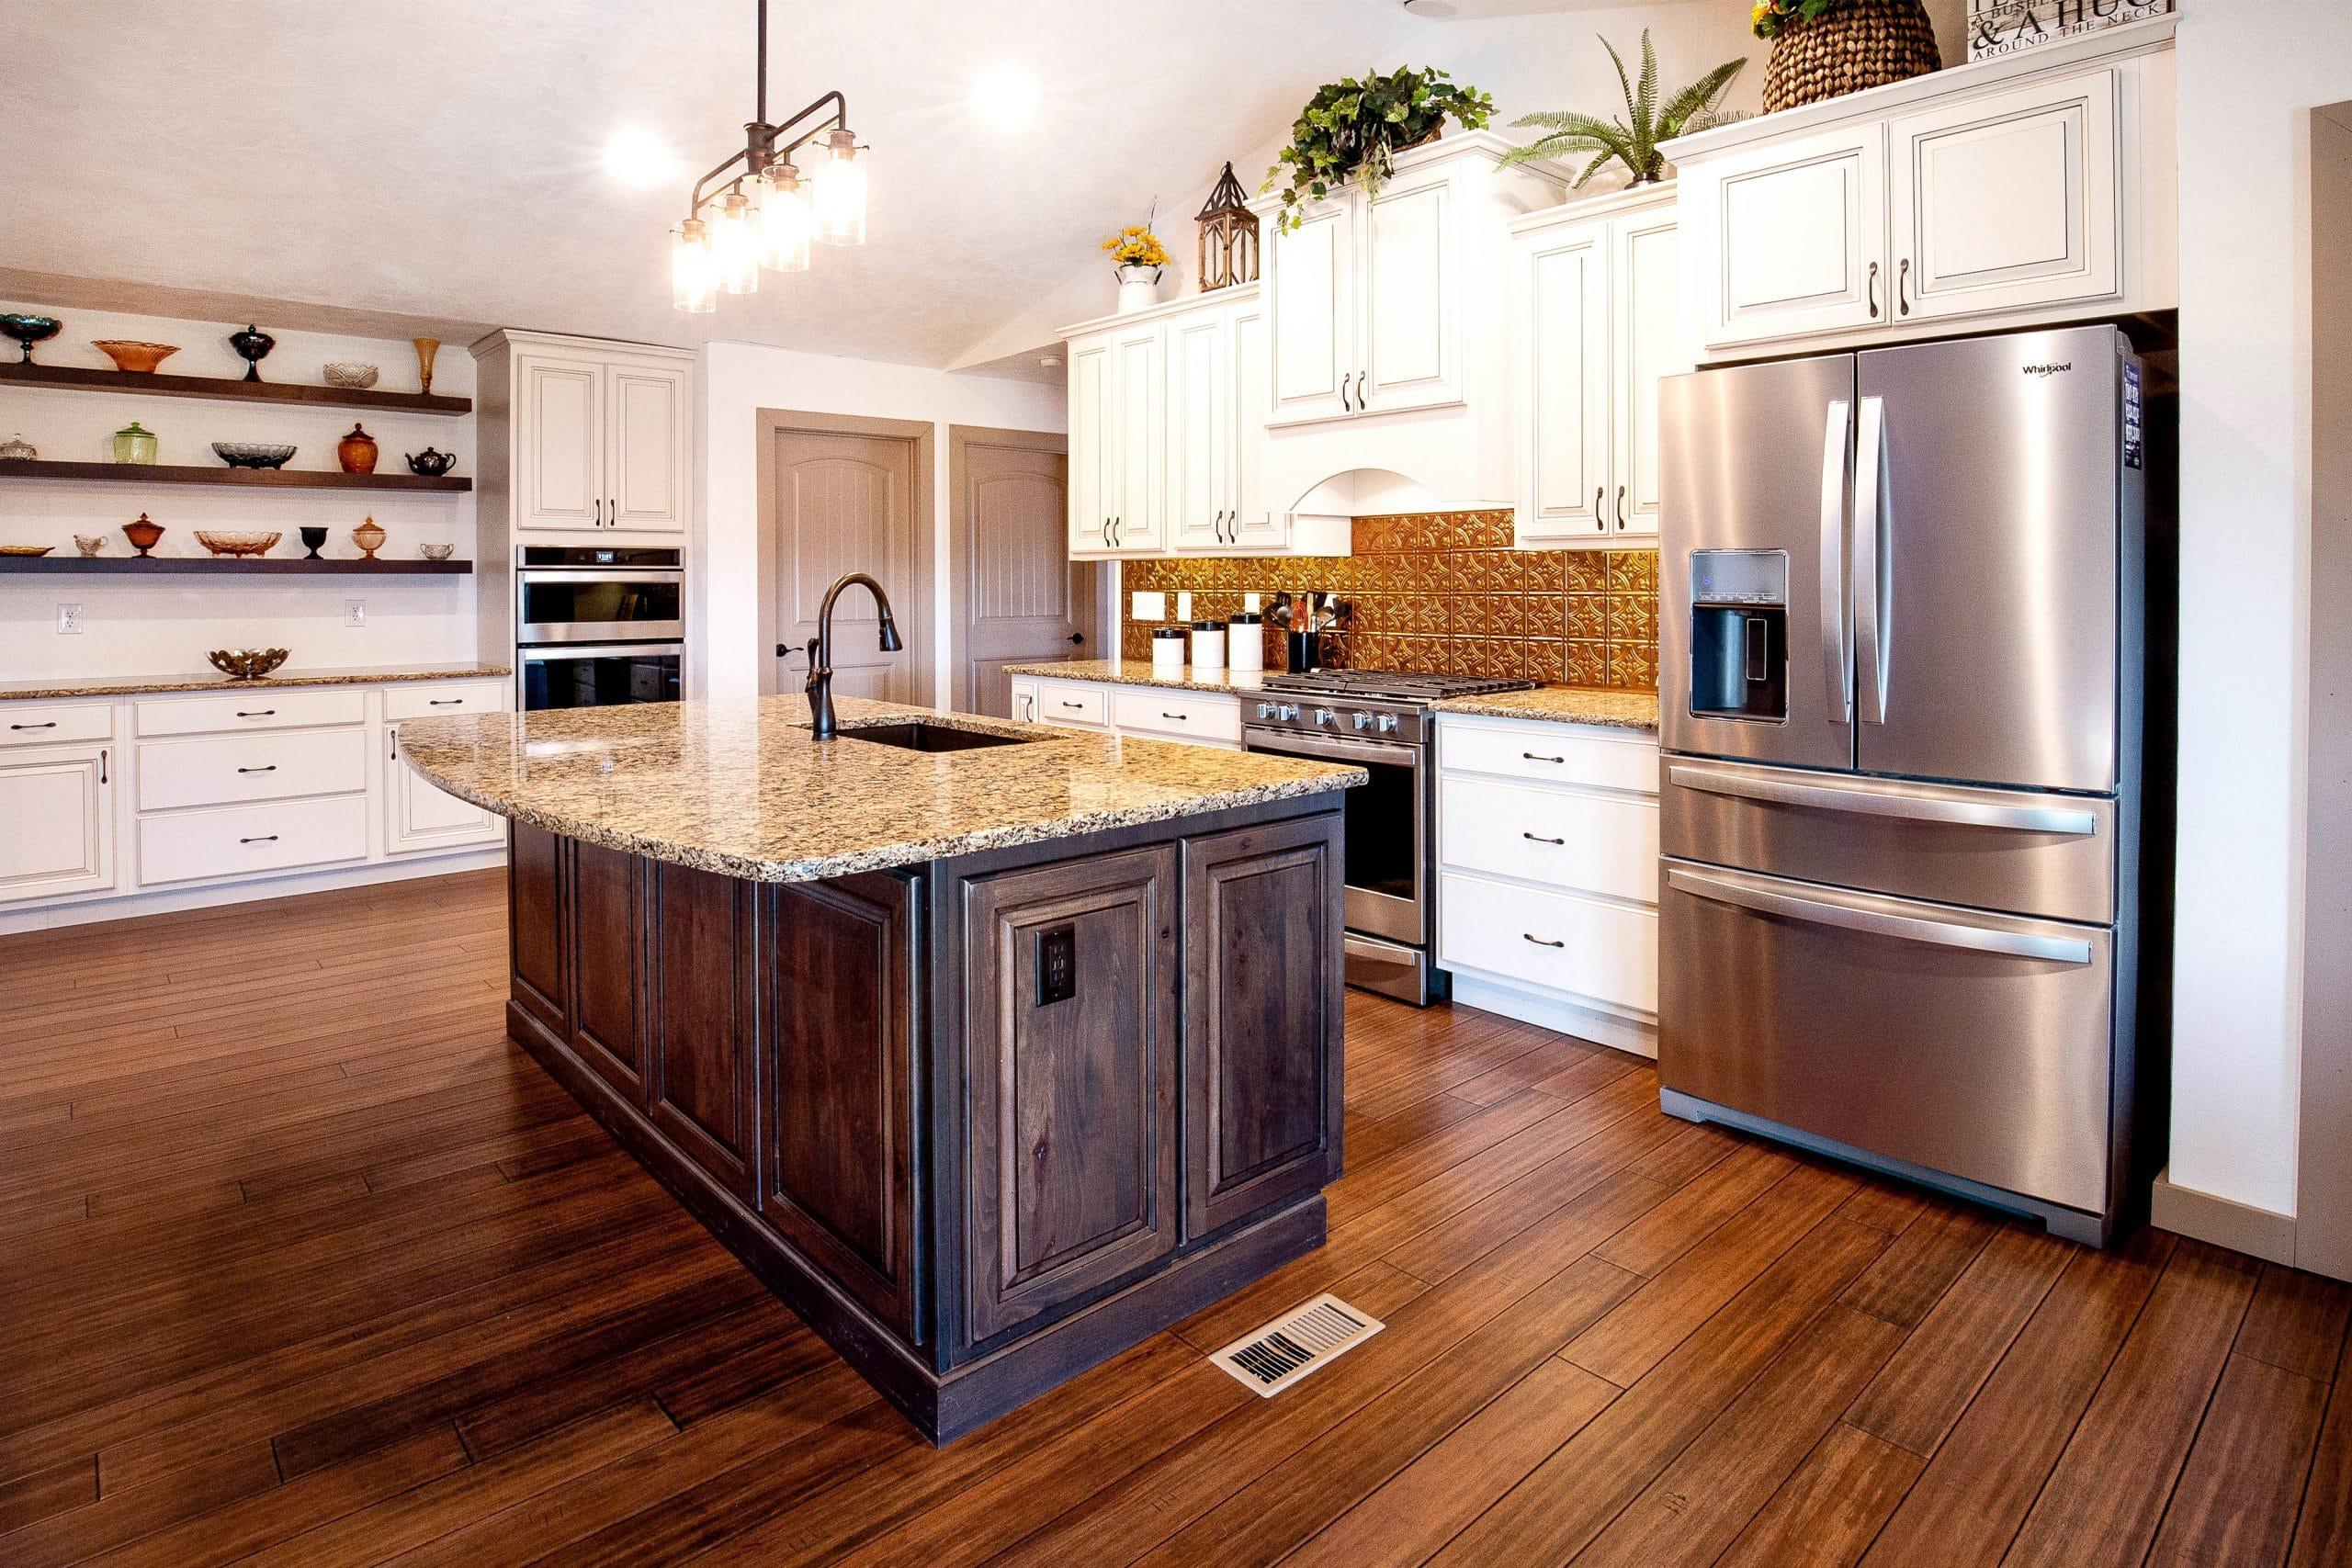 Custom Kitchens | Studio 11 Cabinets & Design